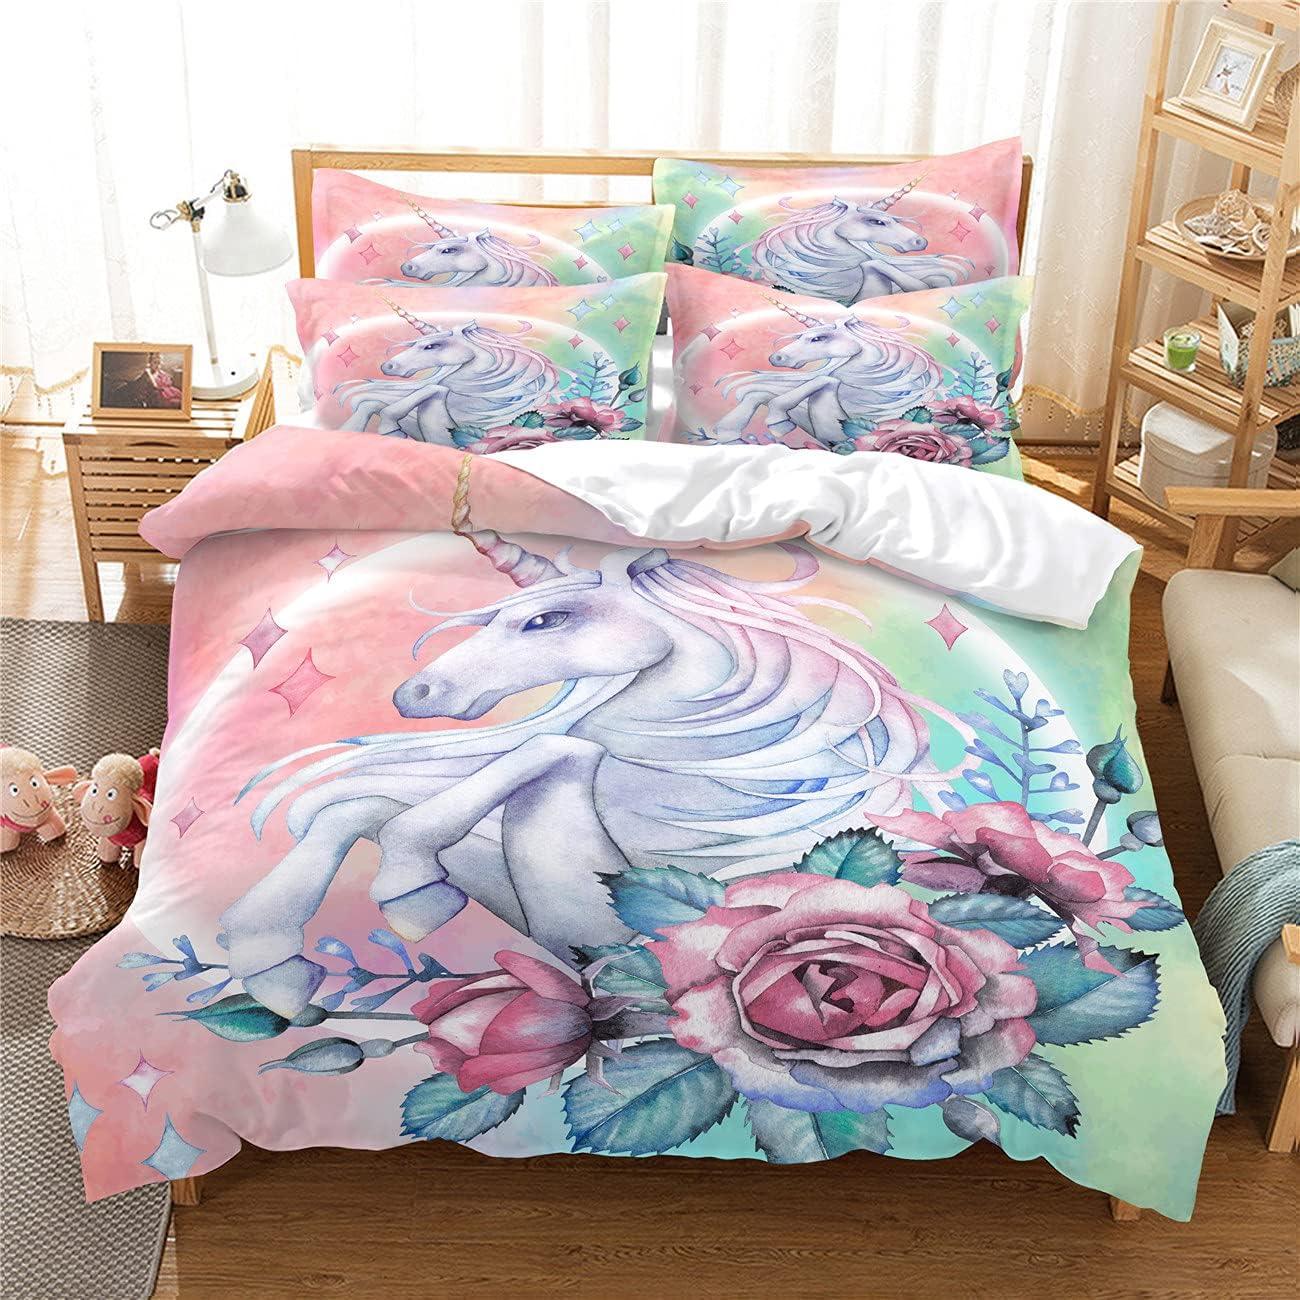 Max 58% OFF MANXI Cartoon Unicorn Flower Bedroom Piece Three Digital In stock P Set